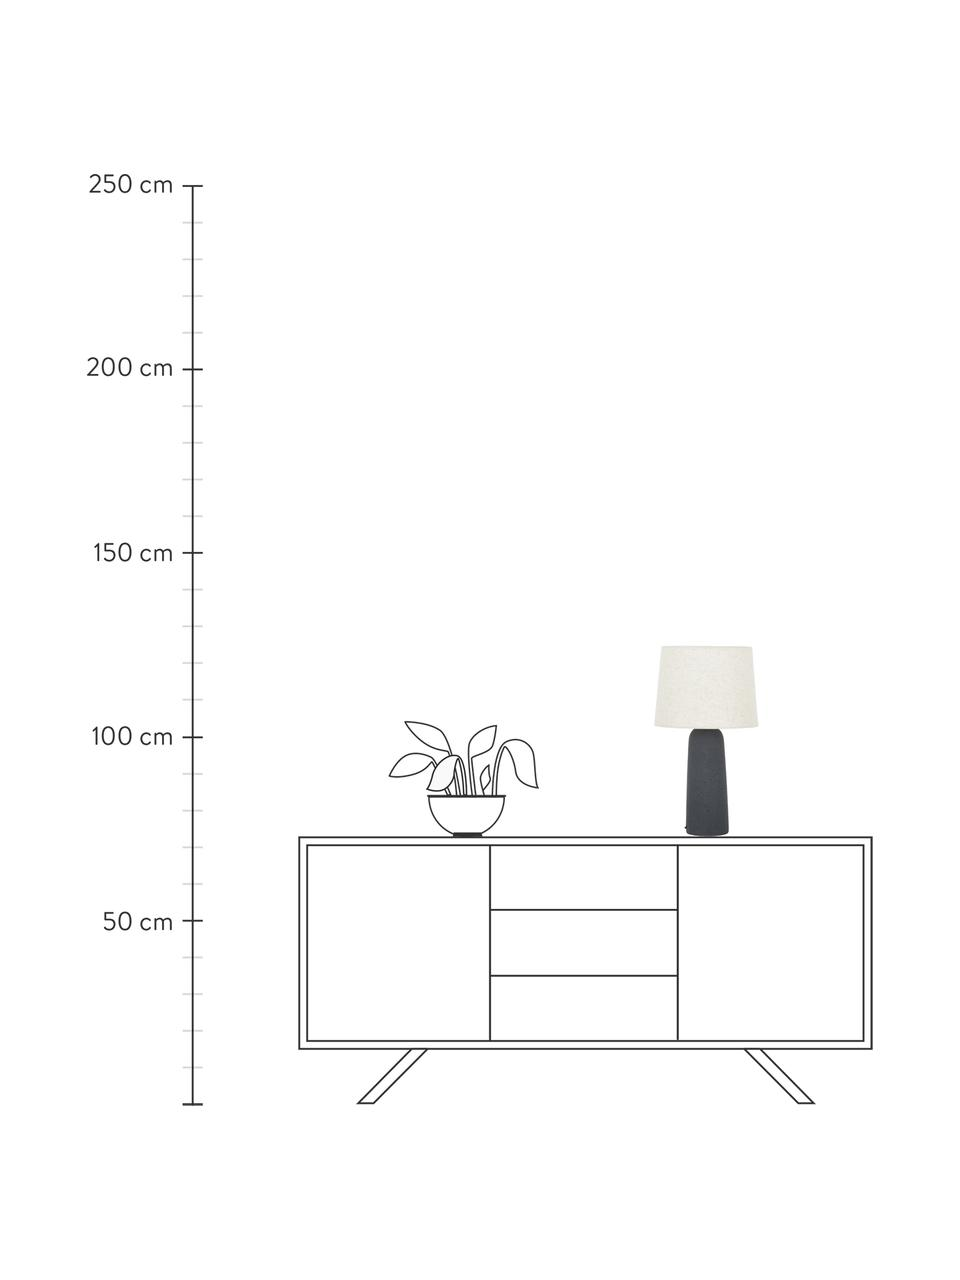 Grote tafellamp Kaya met betonnen voet, Lampenkap: 80% katoen, 20% linnen, Lampvoet: beton, Lampenkap: beige. Lampvoet: donkergrijs. Snoer: zwart, Ø 29 x H 52 cm